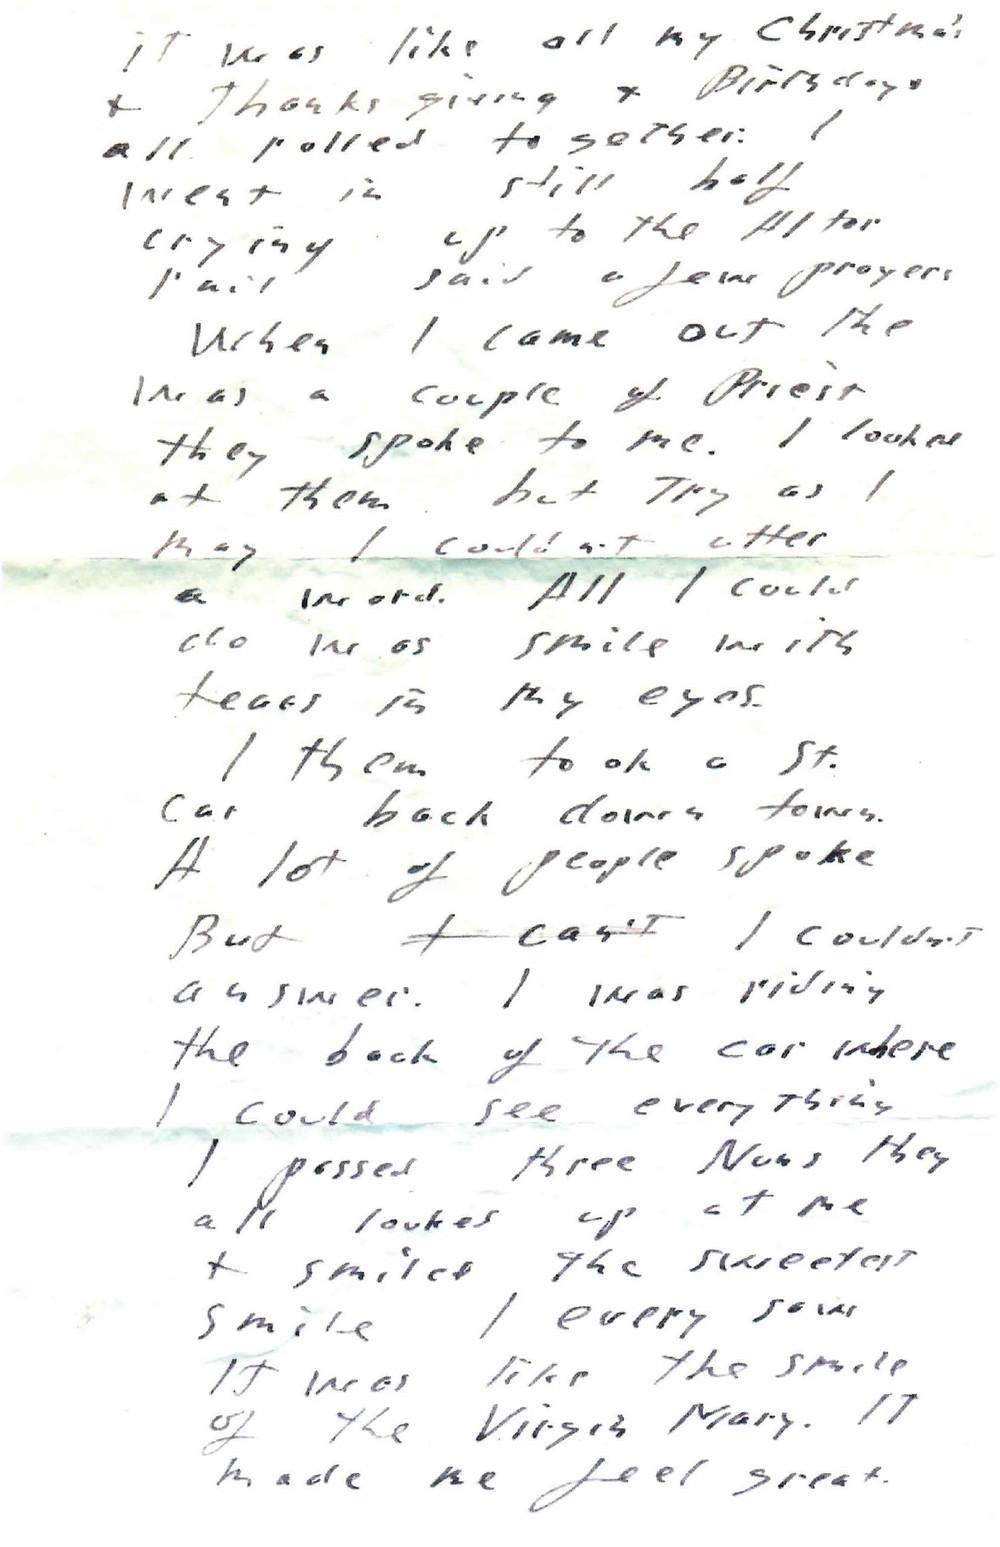 Daddy's letter VJ Day San Fransisco 006.jpg